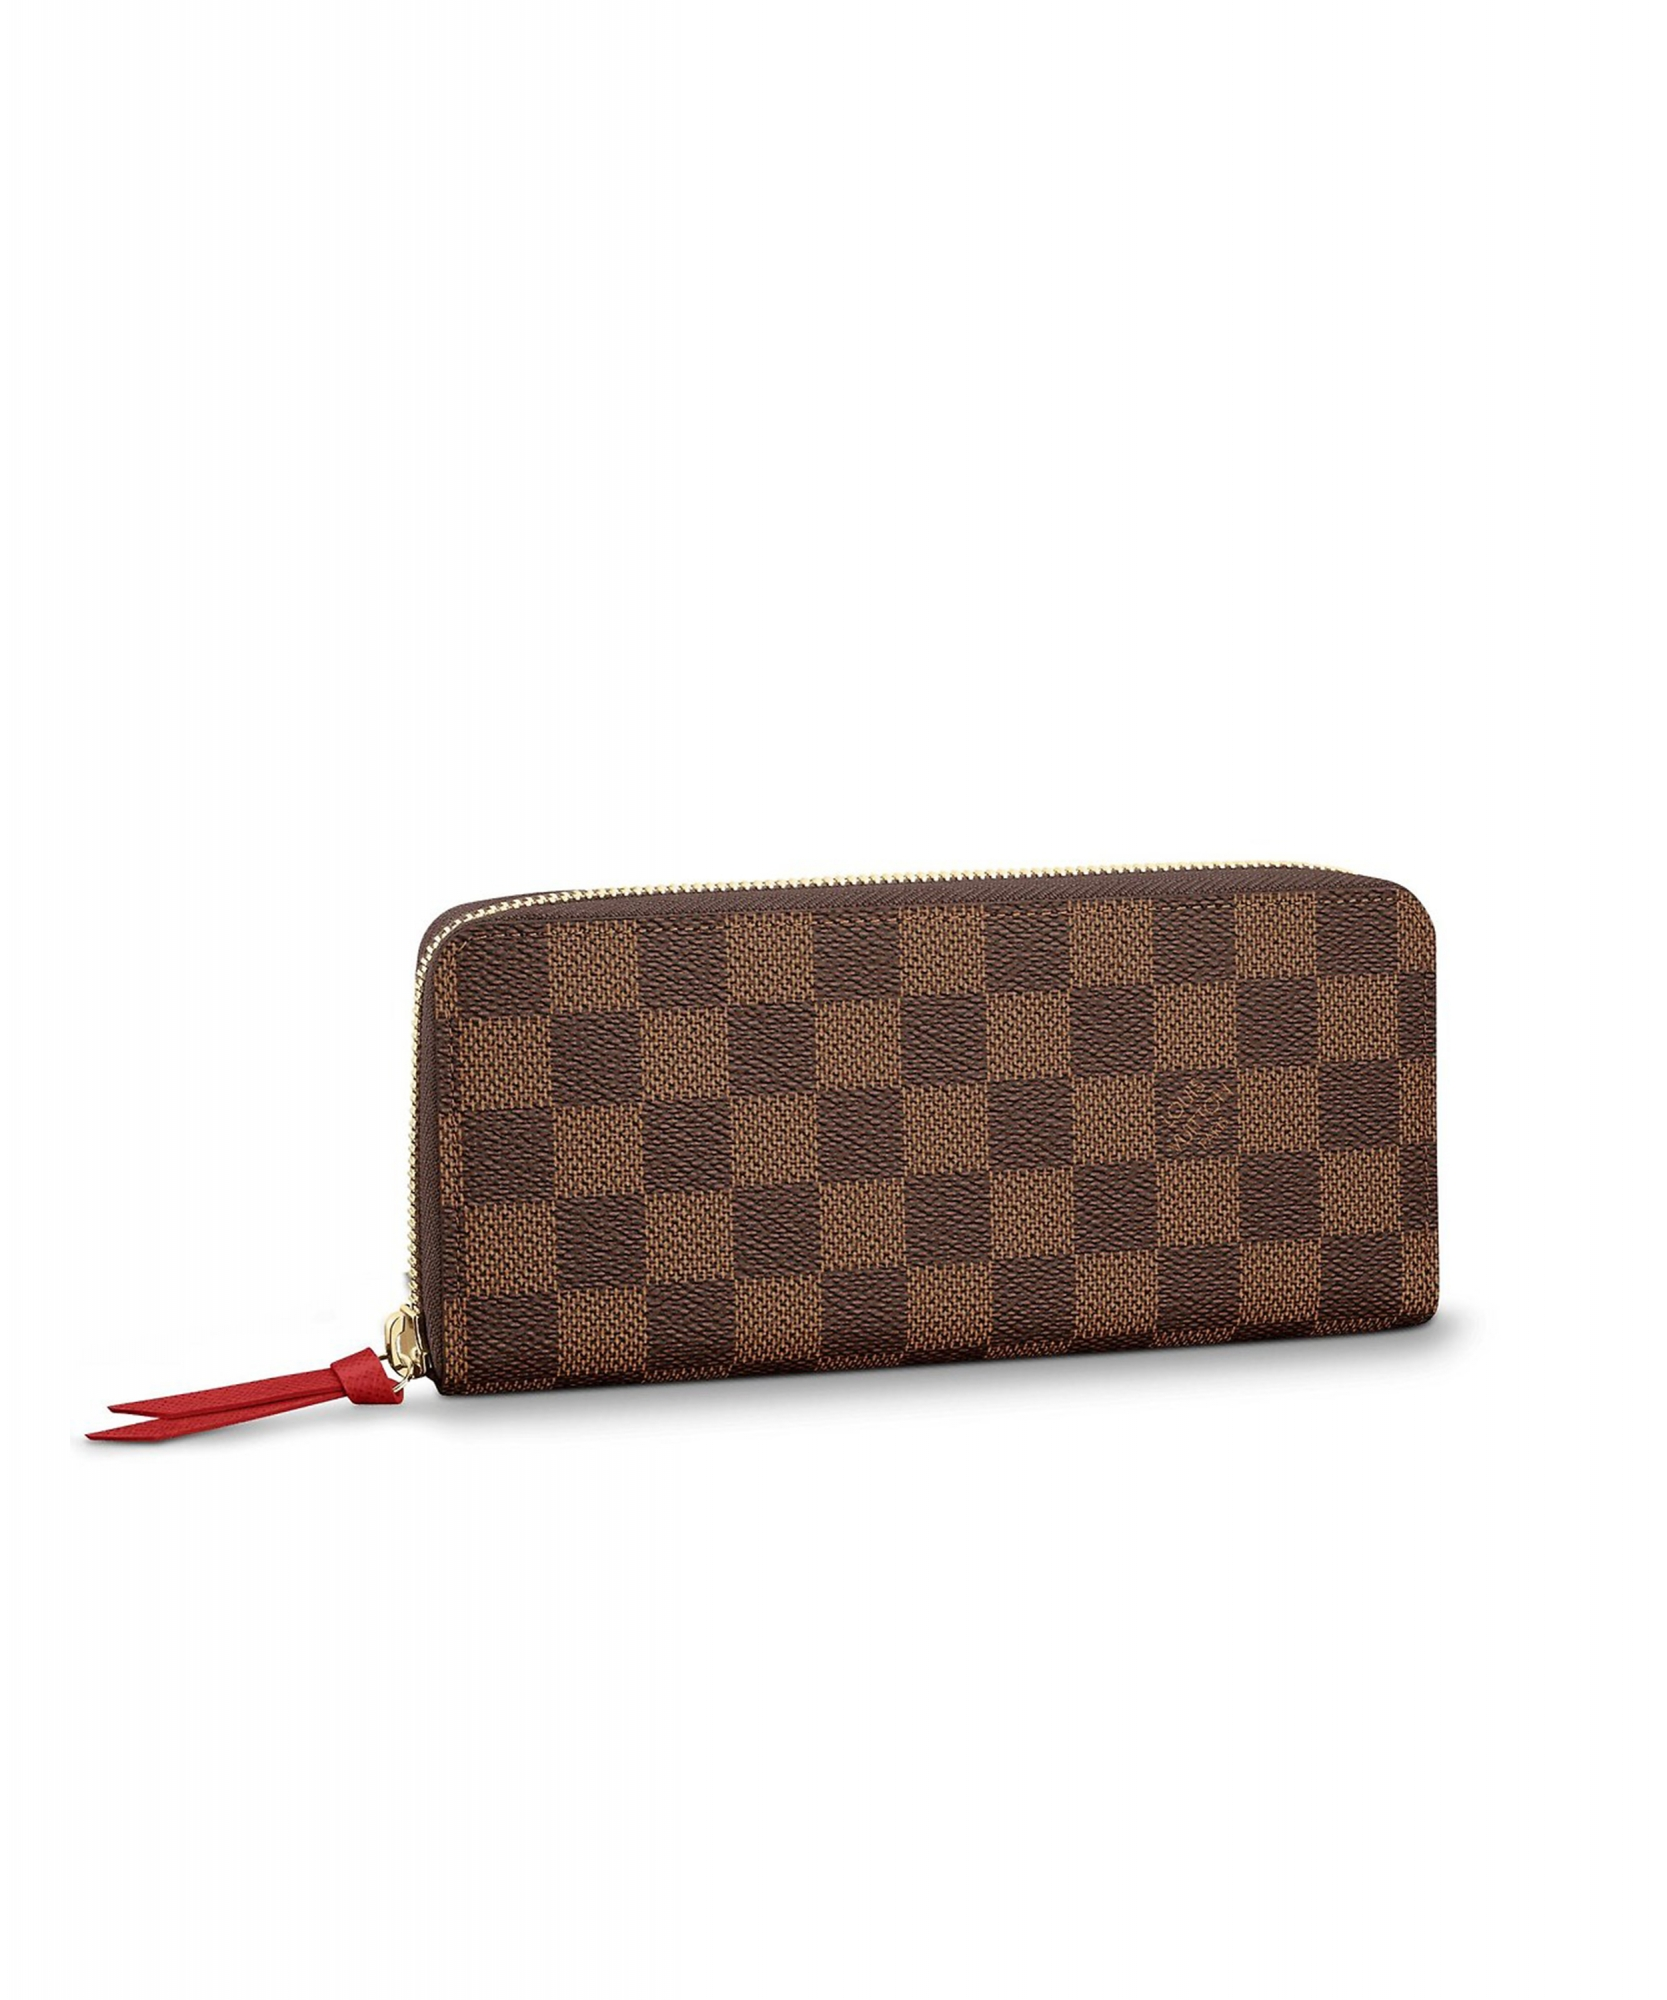 Verwonderend Louis Vuitton Clémence Wallet Damier Ebene | La Doyenne PC-67